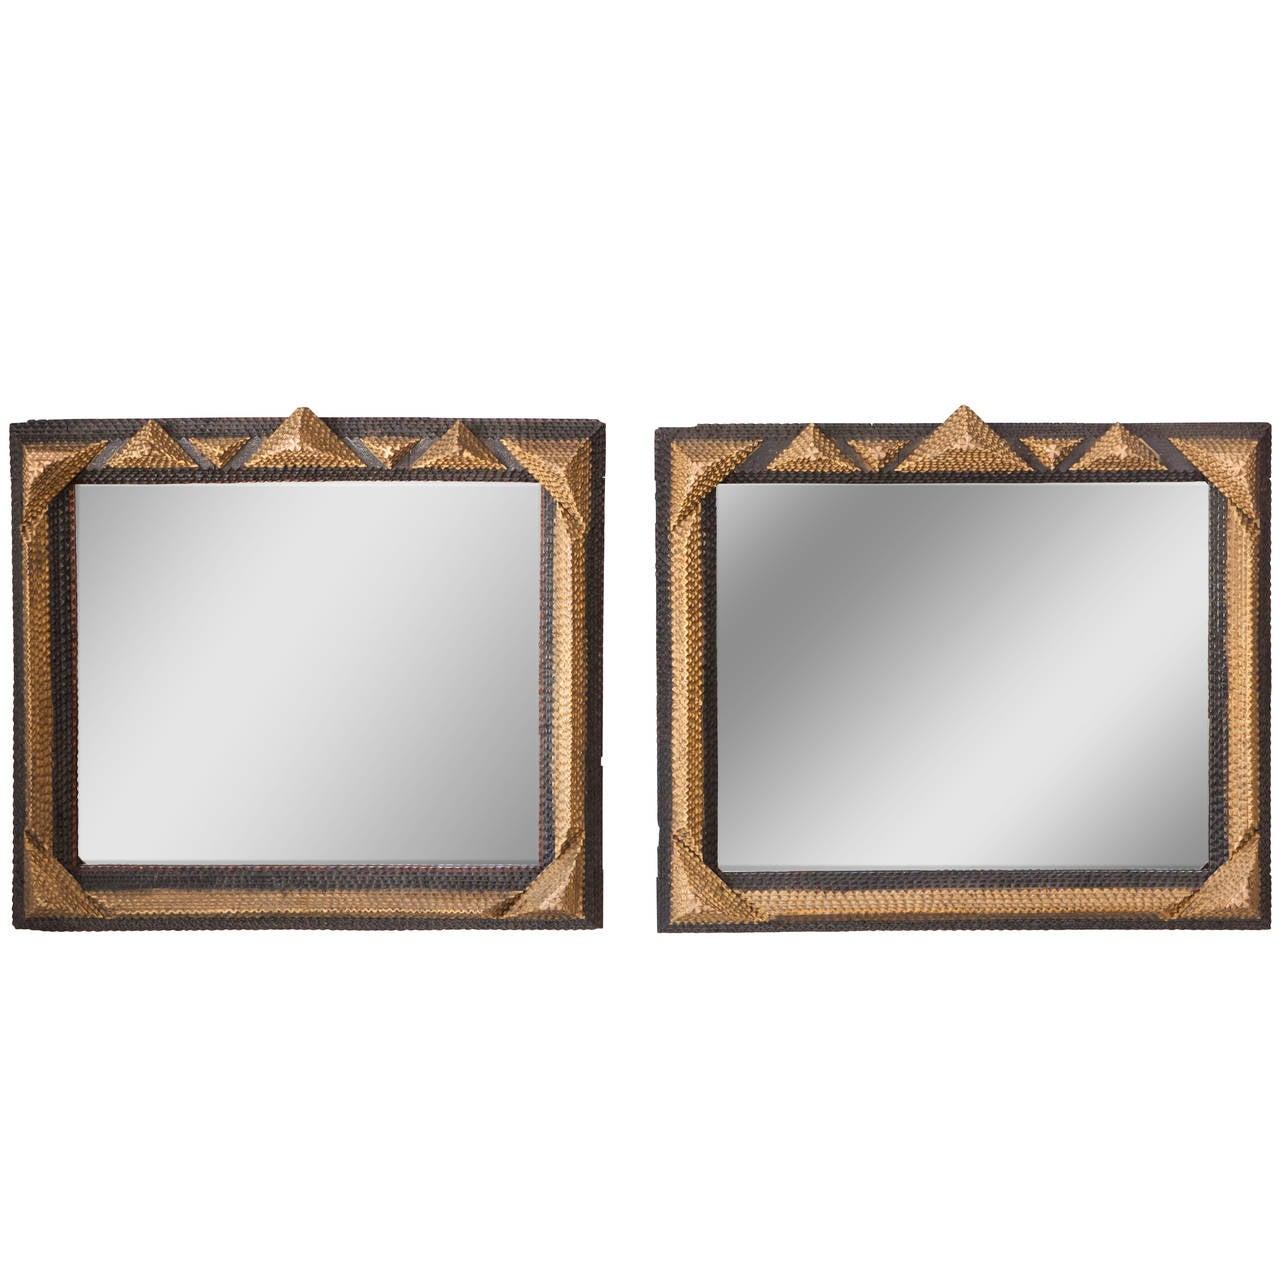 Pair of Distinctive Tramp Art Framed Mirrors